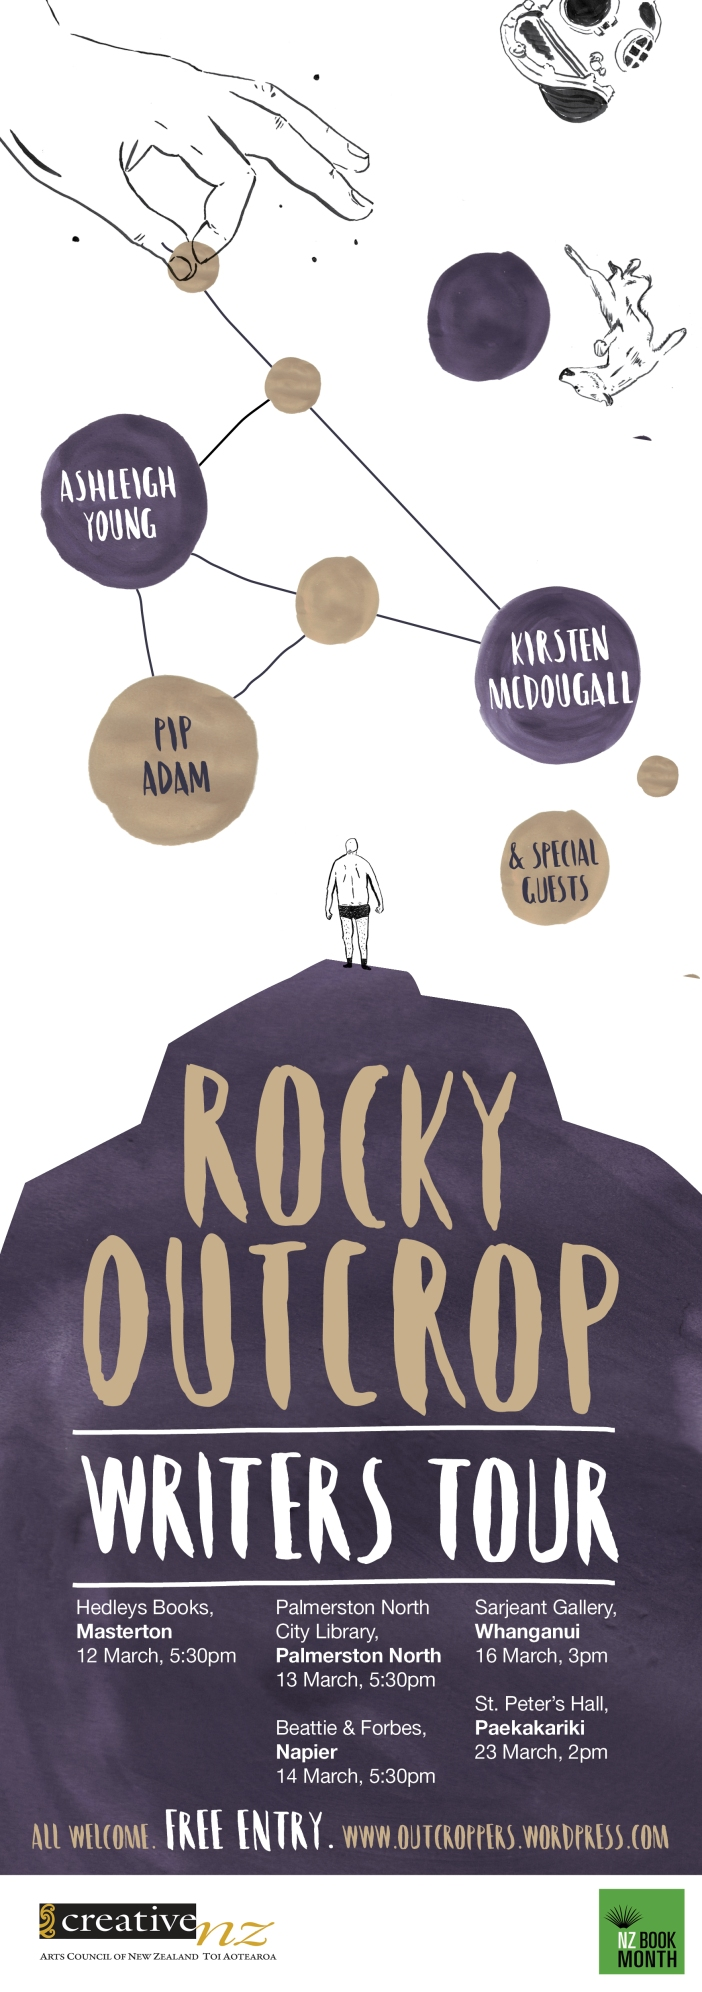 RockyOutcrop BIG